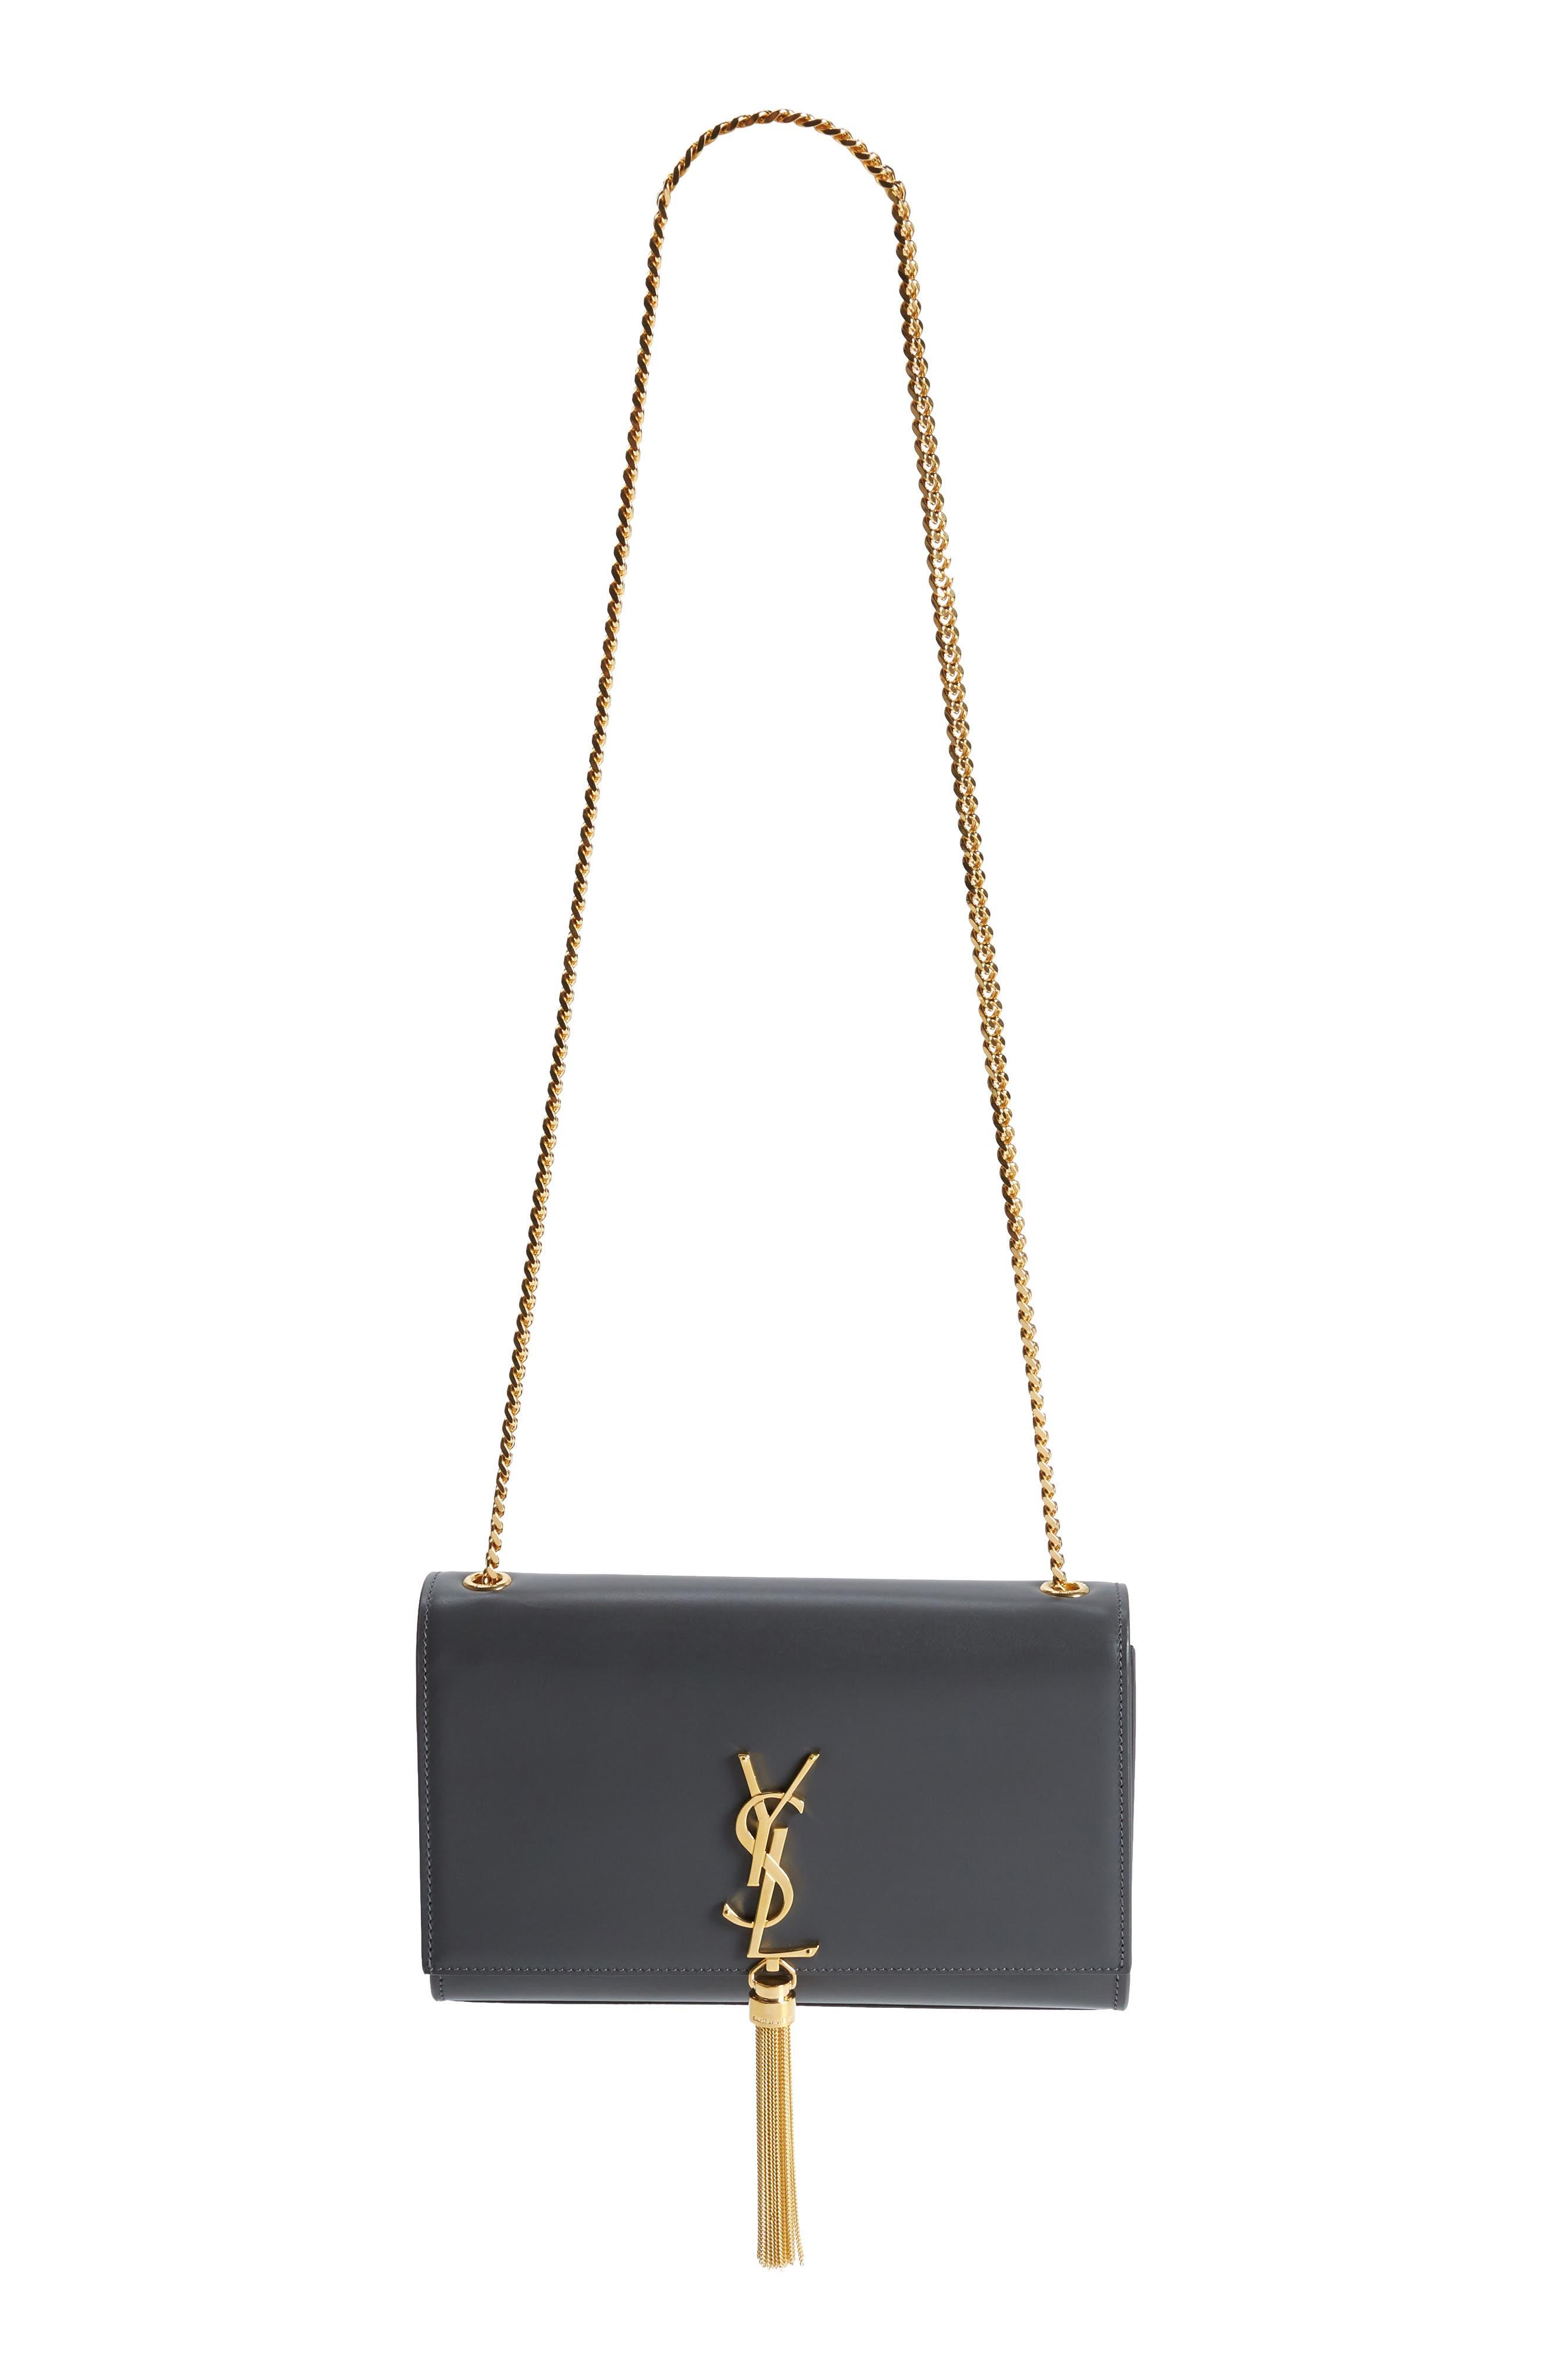 Saint Laurent 'Medium Monogram' Leather Shoulder Bag